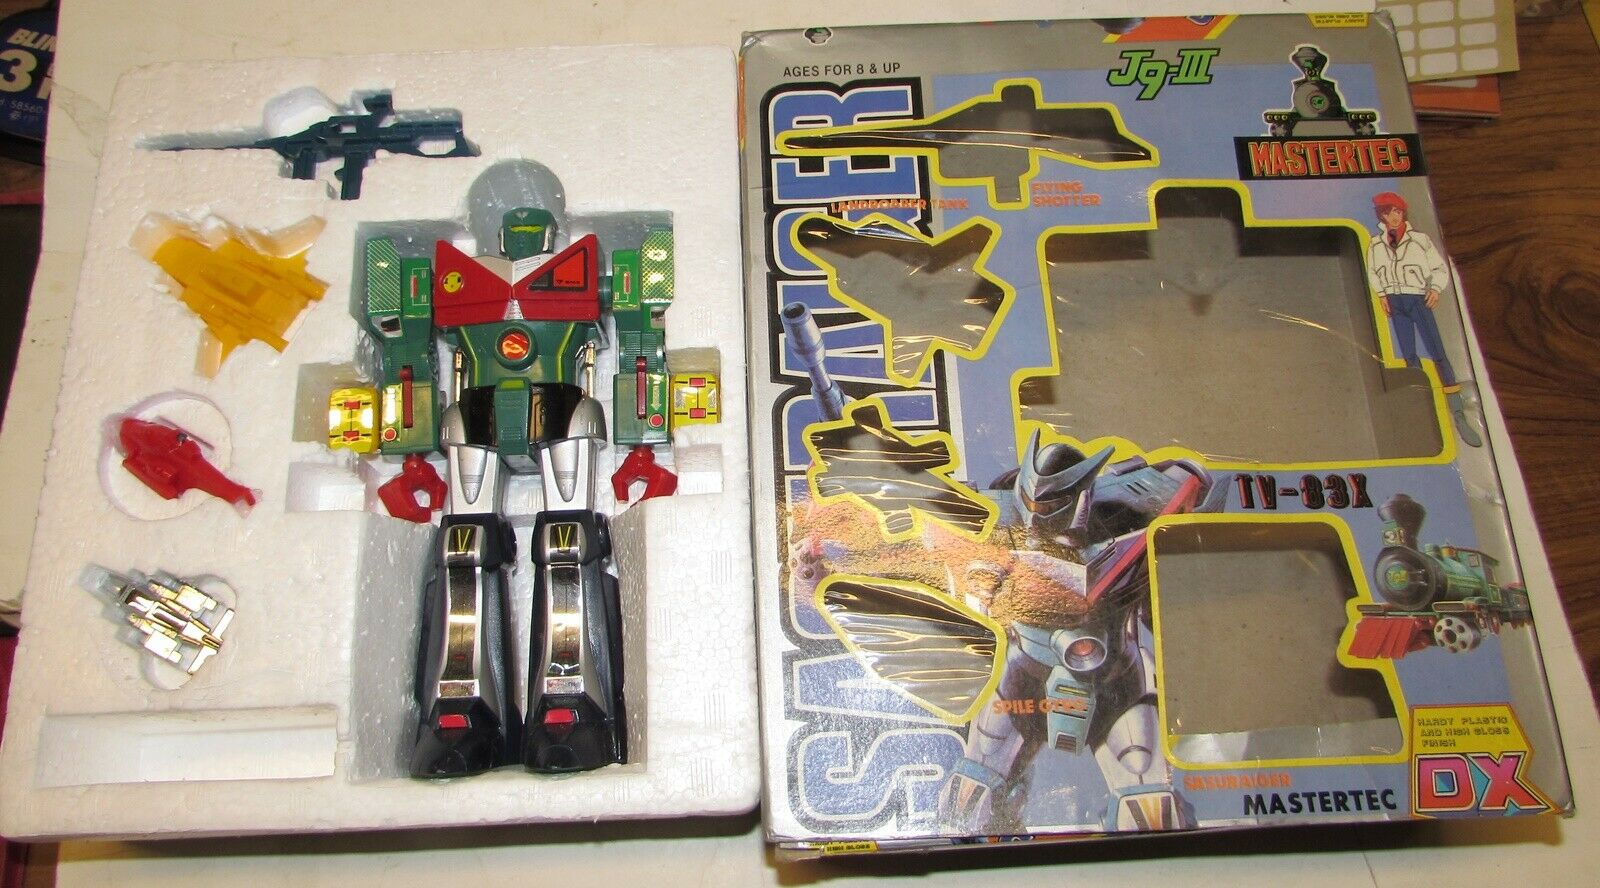 VINTAGE sasuraiger Shogun Robo mastertec DX J9 III rorbot nella scatola original